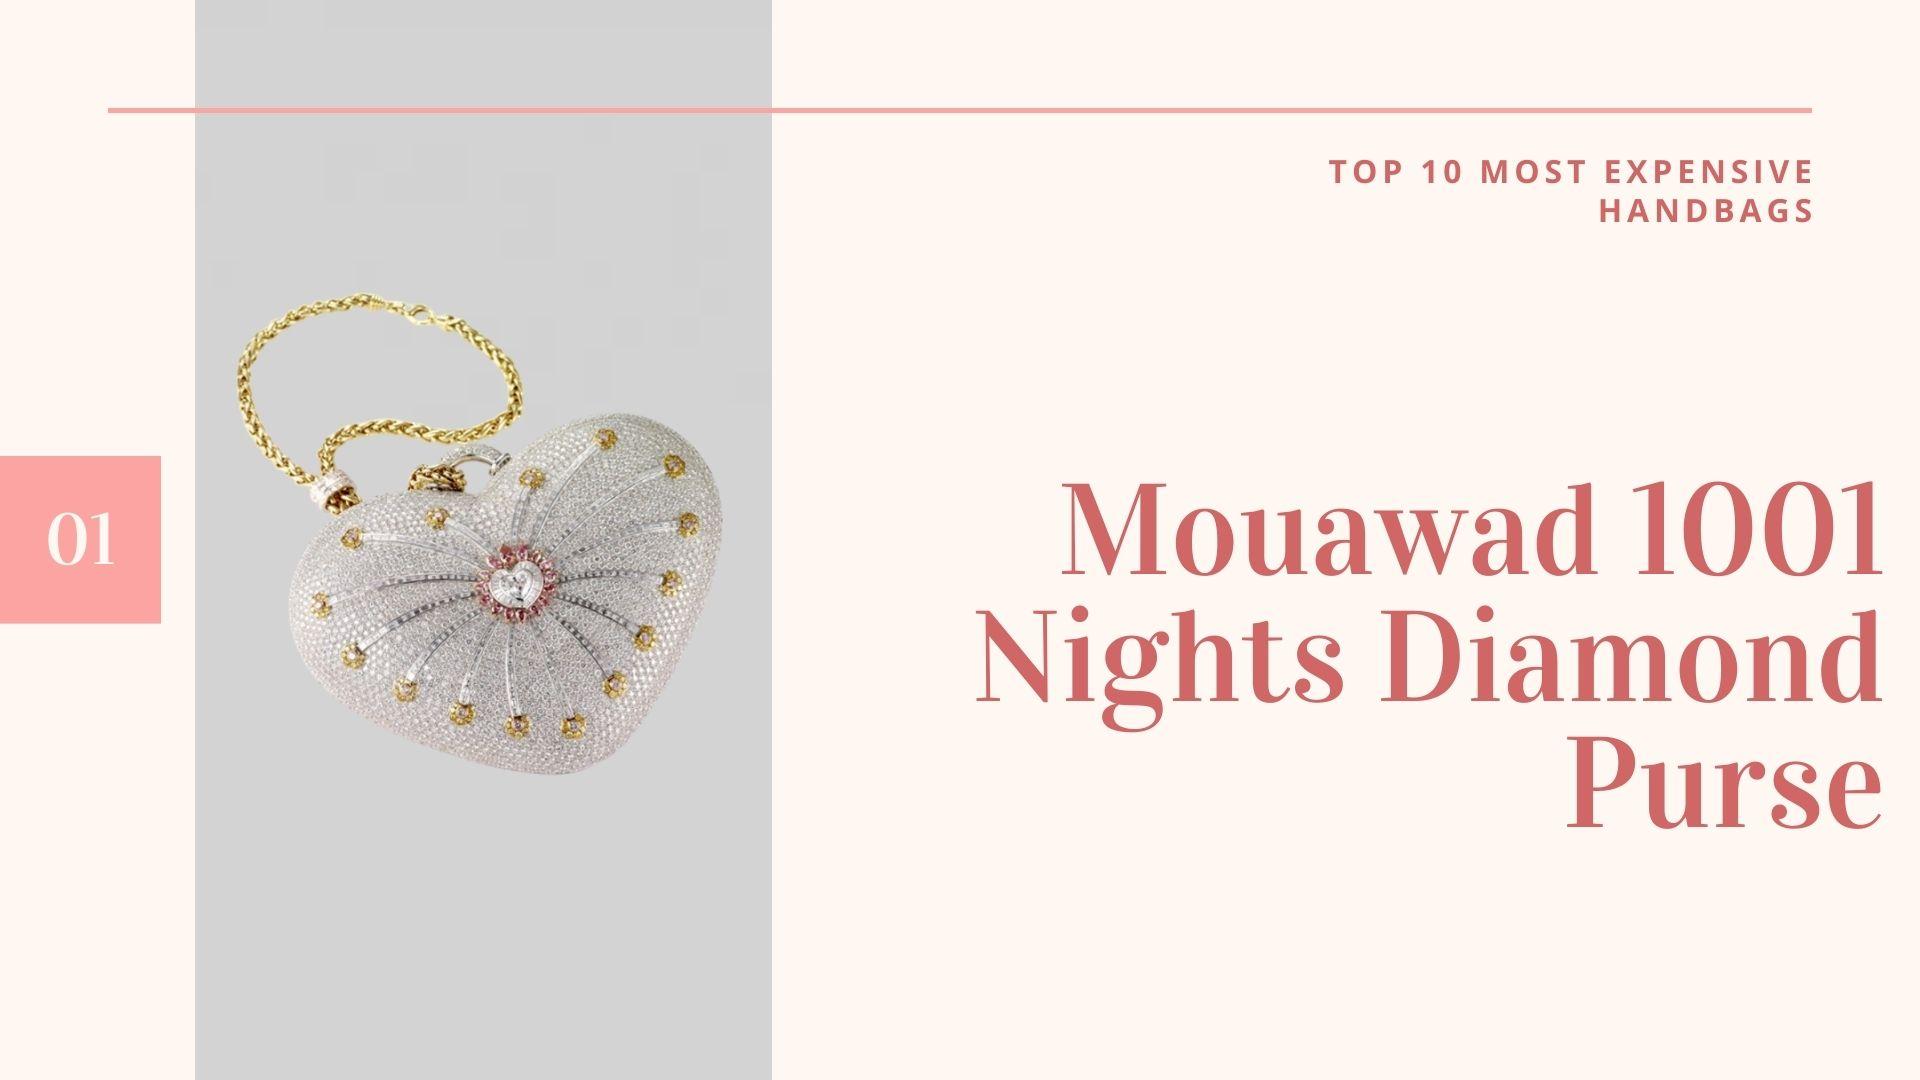 Mouawad 1001 Nights Diamond Purse - กระเป๋าที่แพงที่สุดในโลก